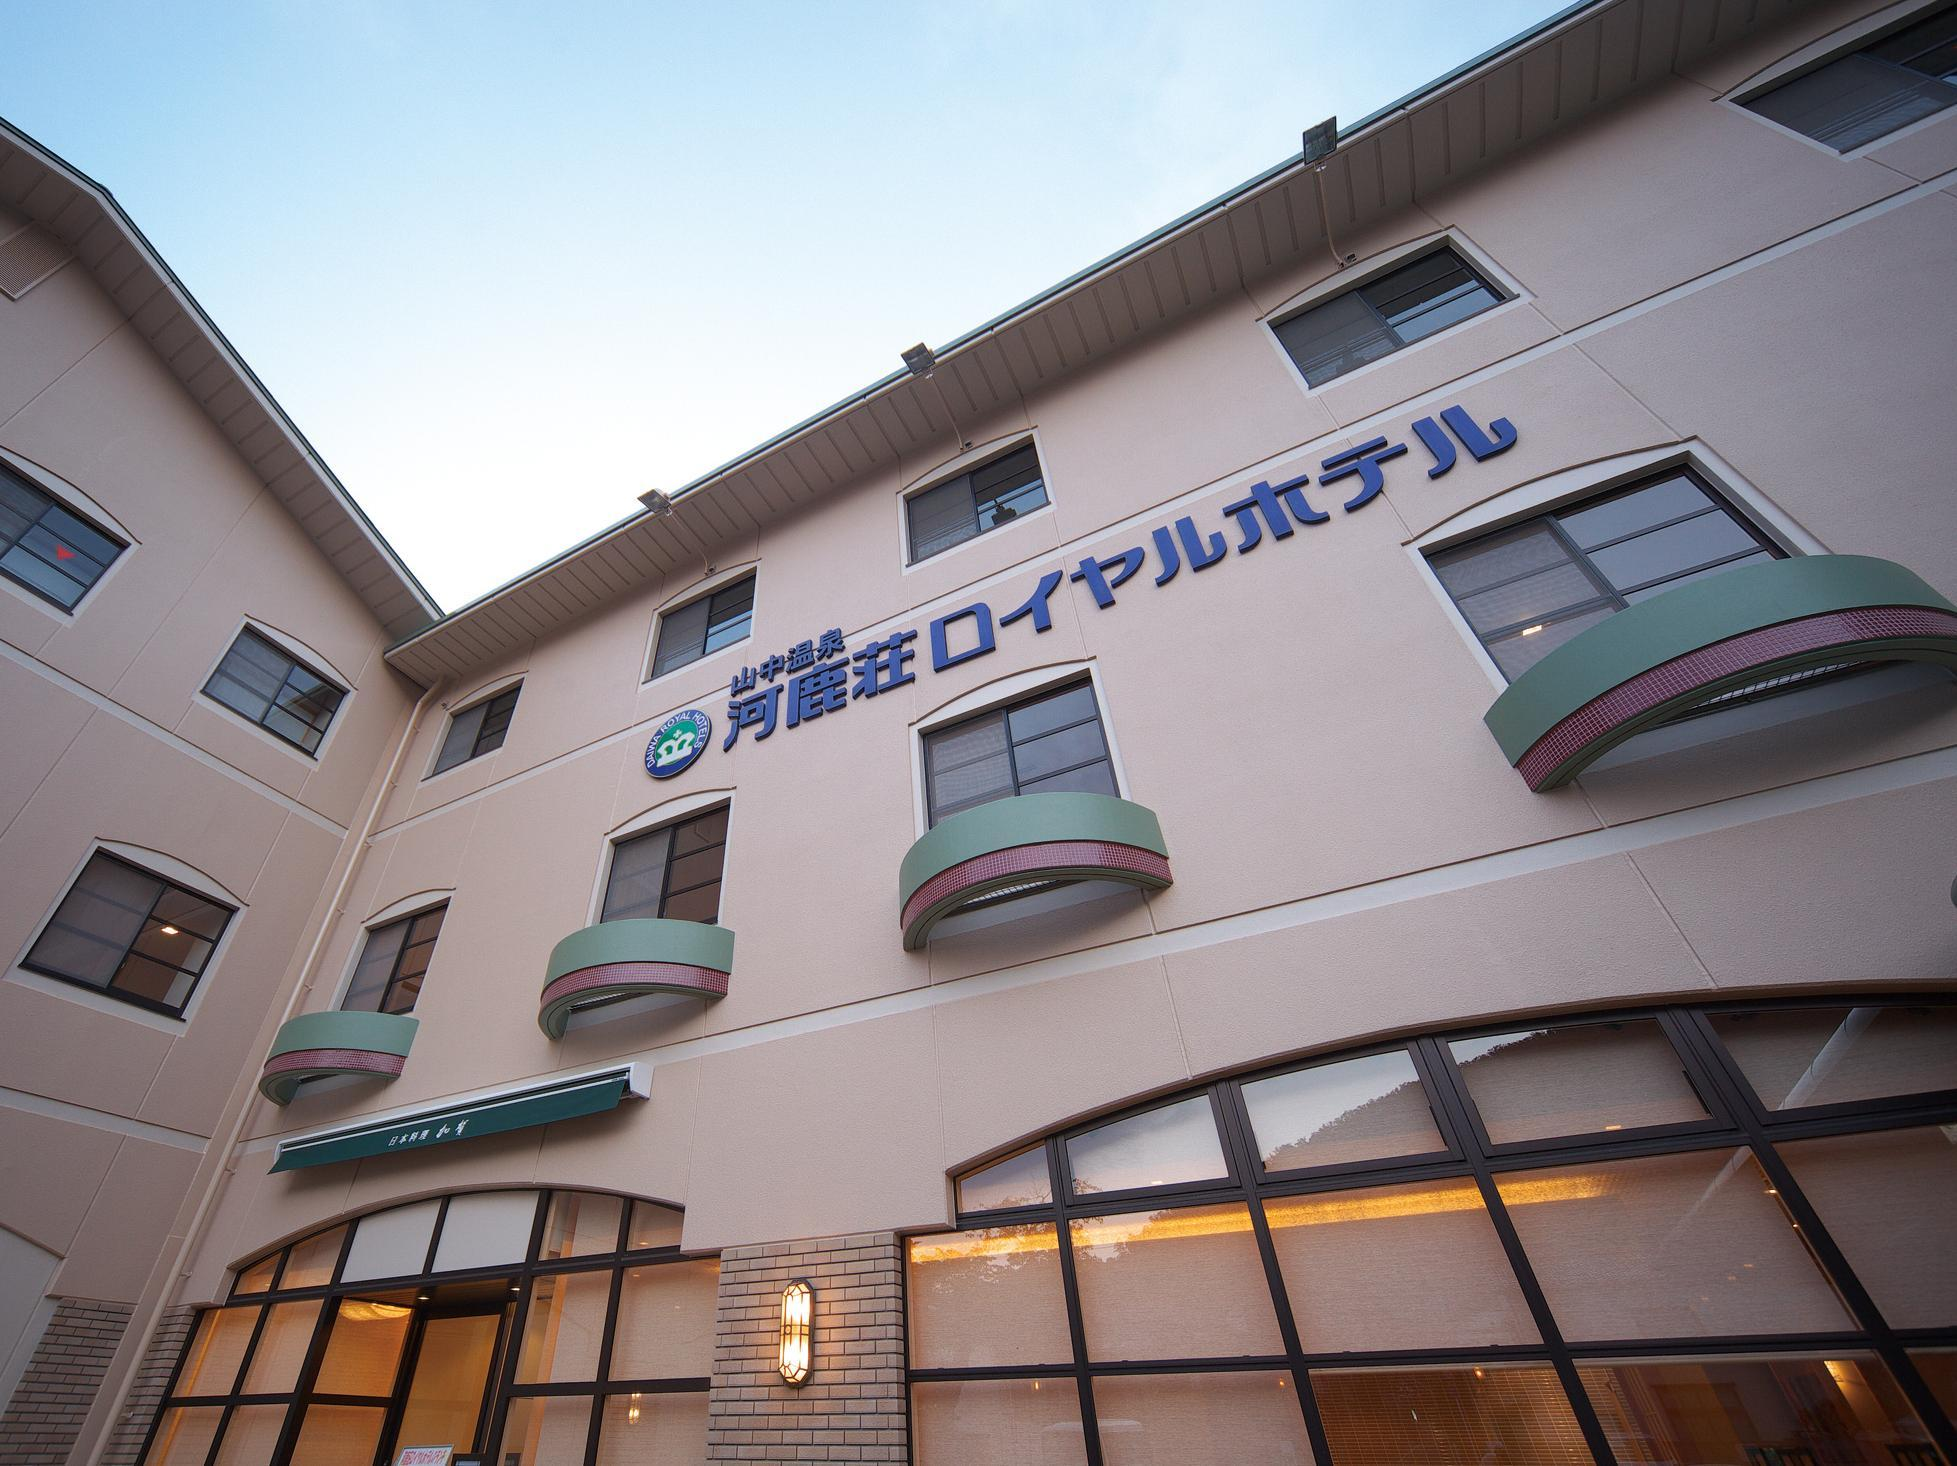 Royal Hotel YAMANAKA ONSEN KAJIKASO, Kaga